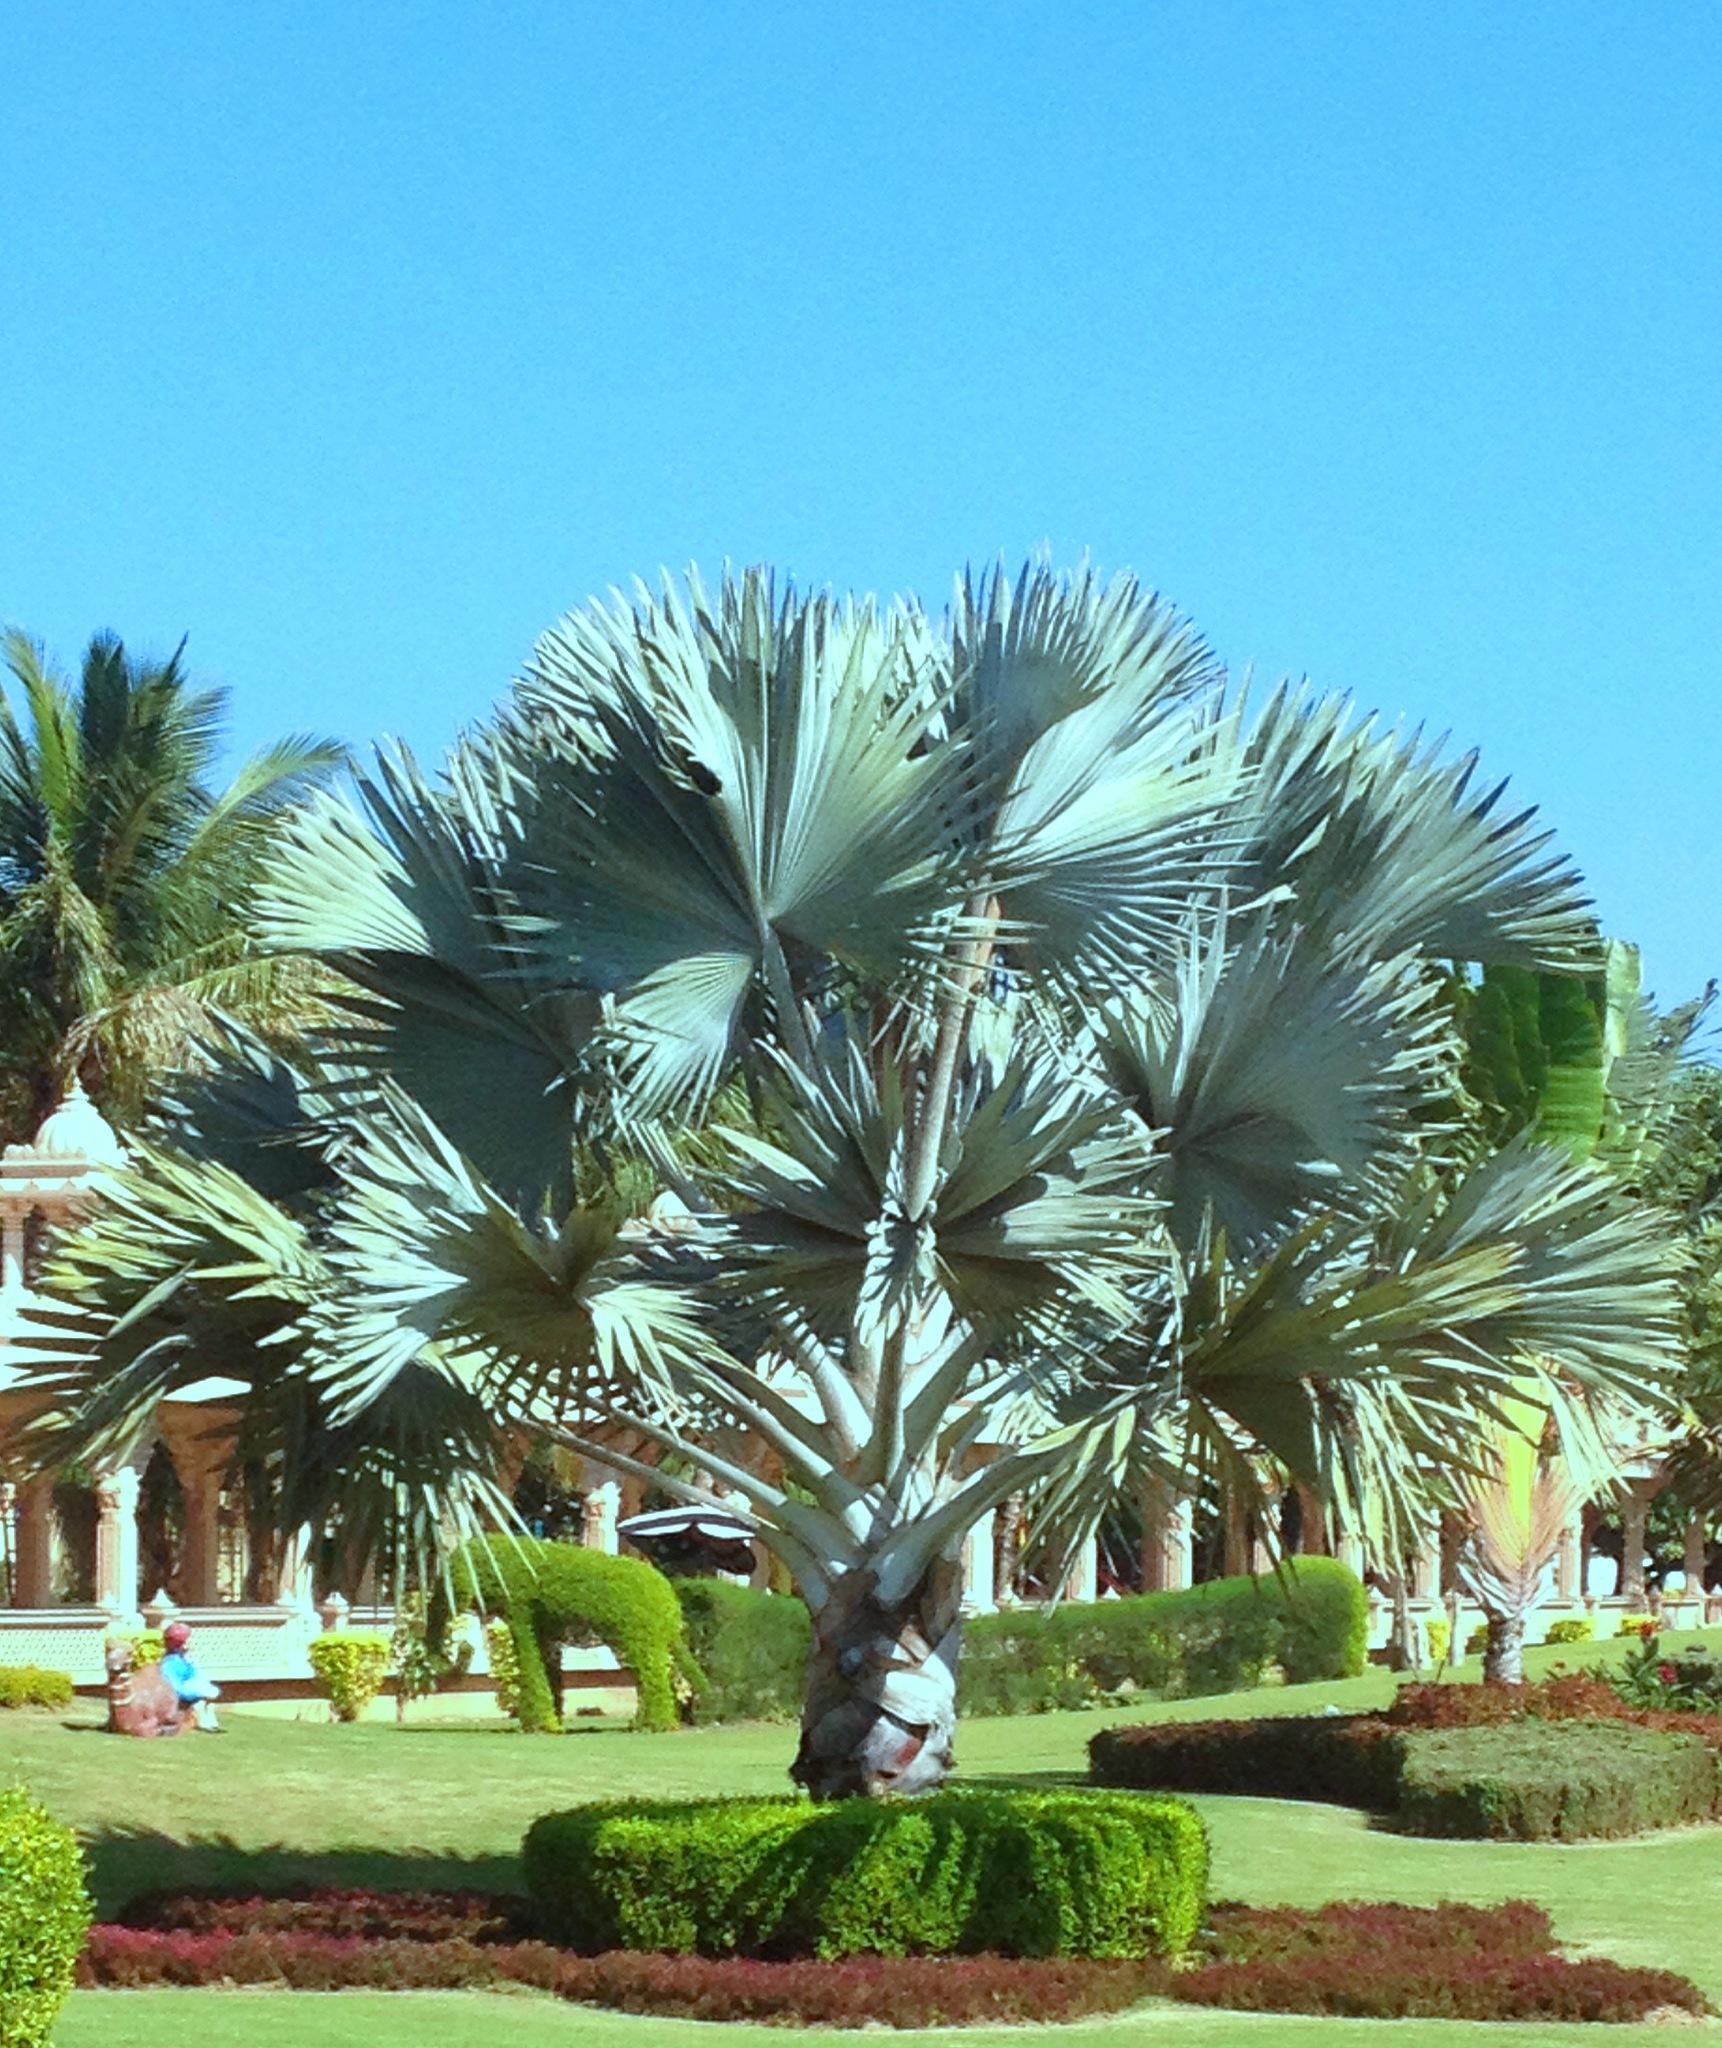 Tree Nature - Akshardham Temple - Garden - Surat by Bharat75